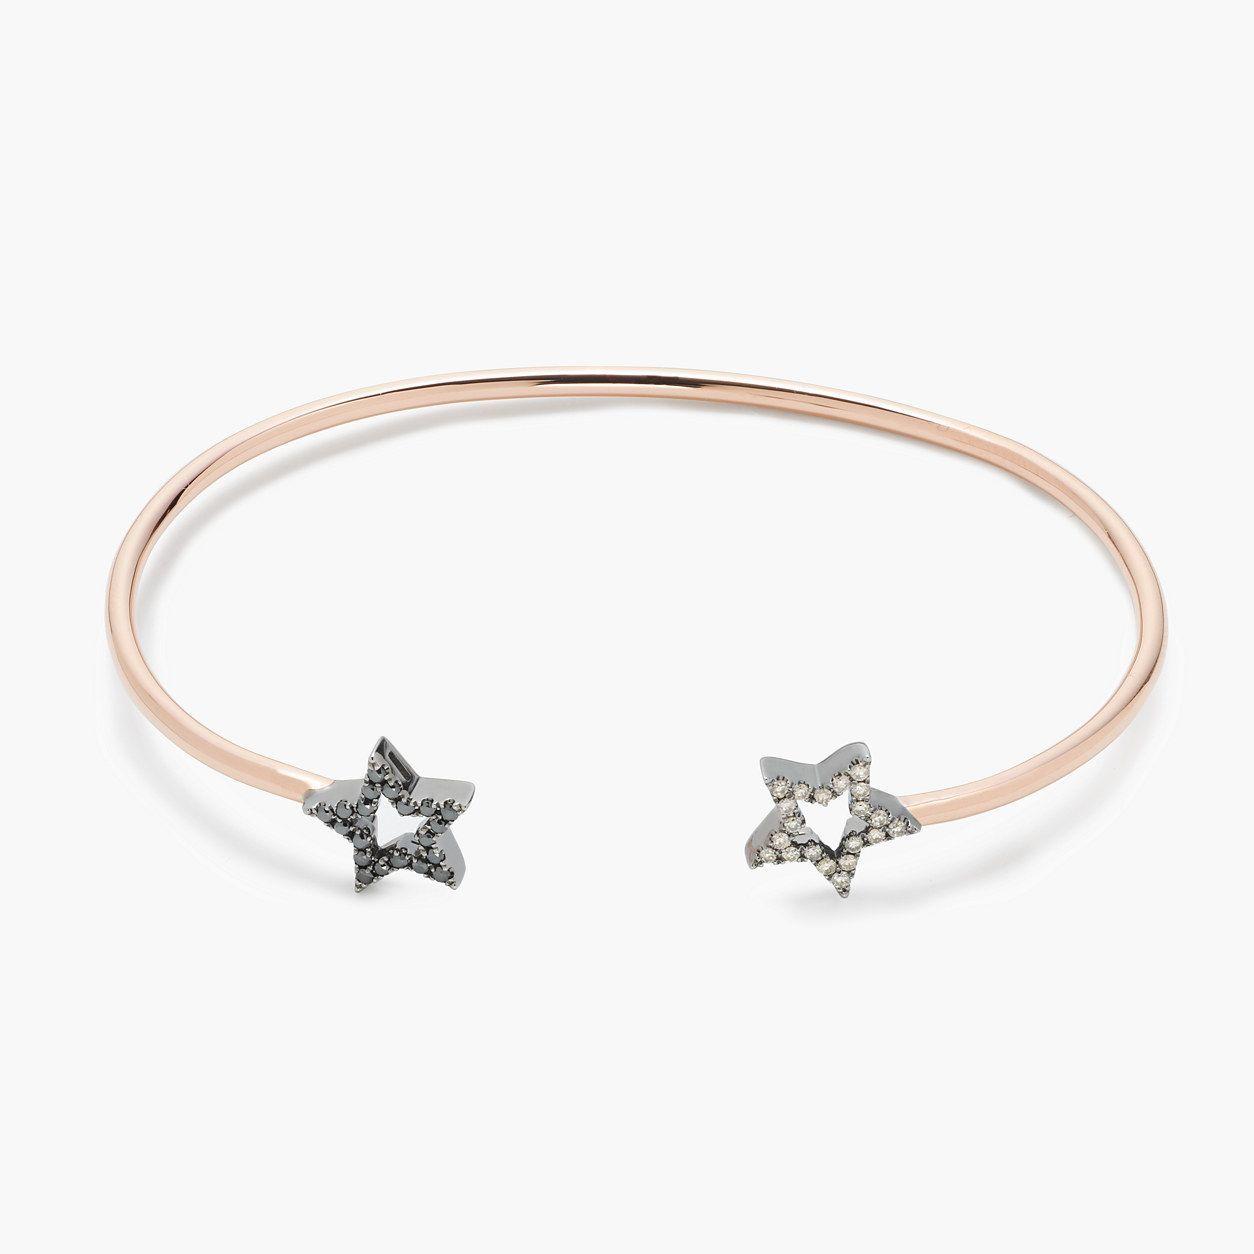 Rosa de la cruz london k gold and diamond double star bracelet